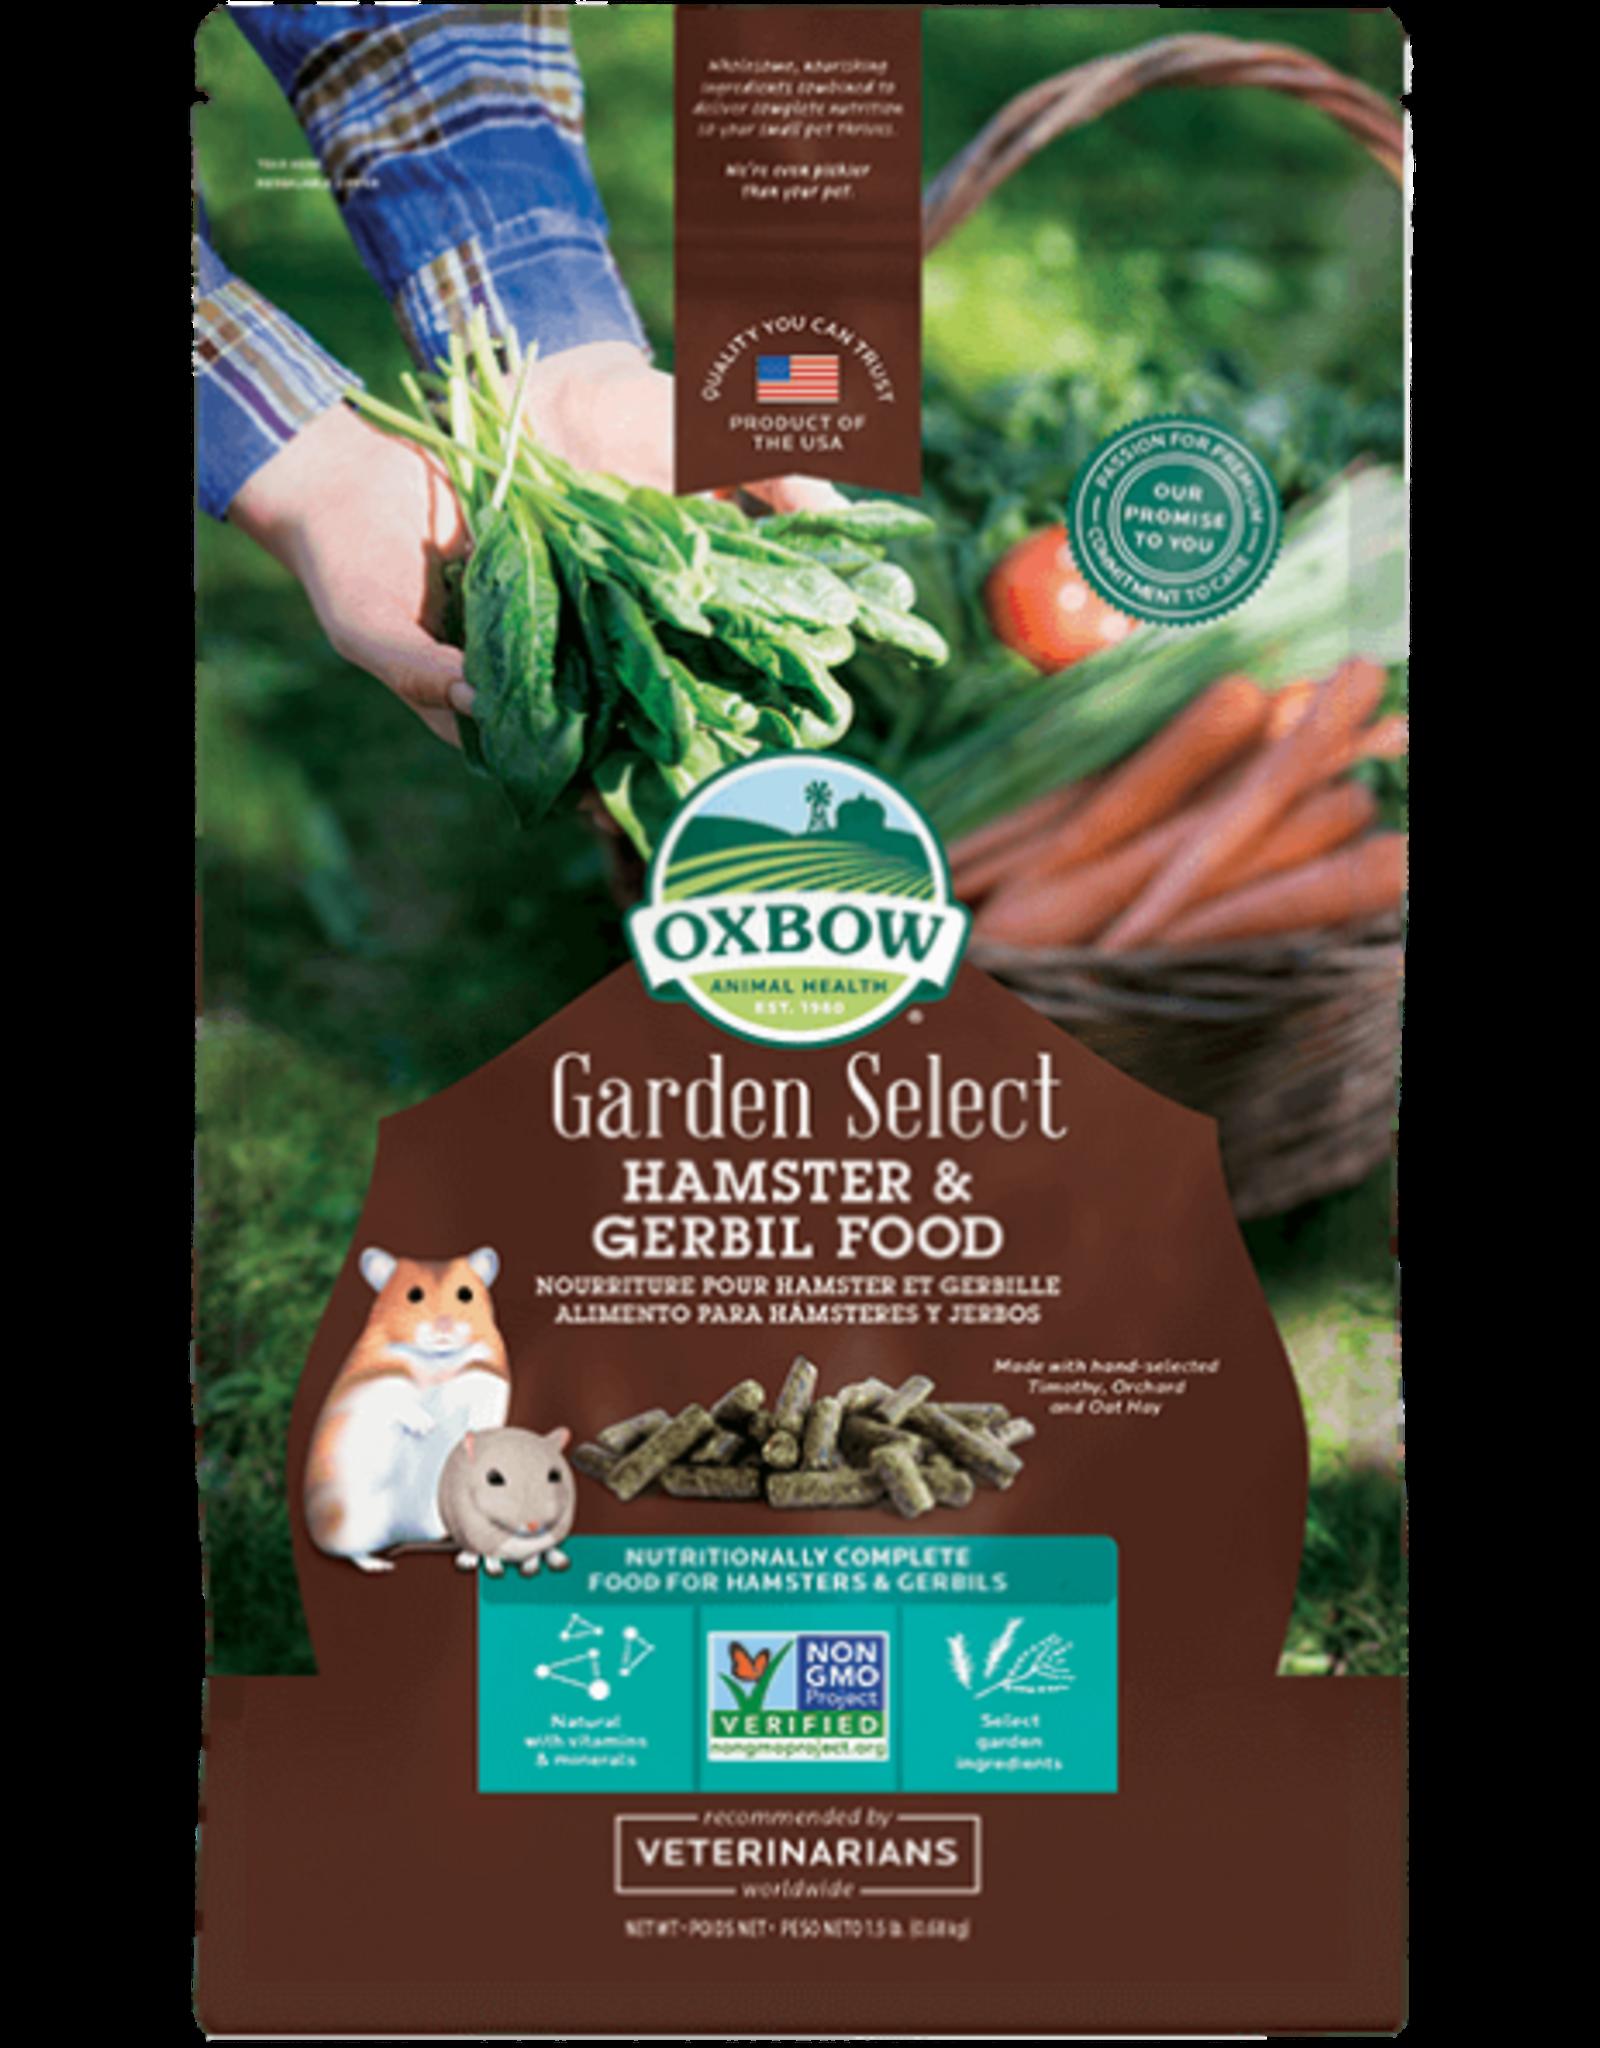 Oxbow OXBOW Garden Select Hamster and Gerbil Food 1.5 pound Bag